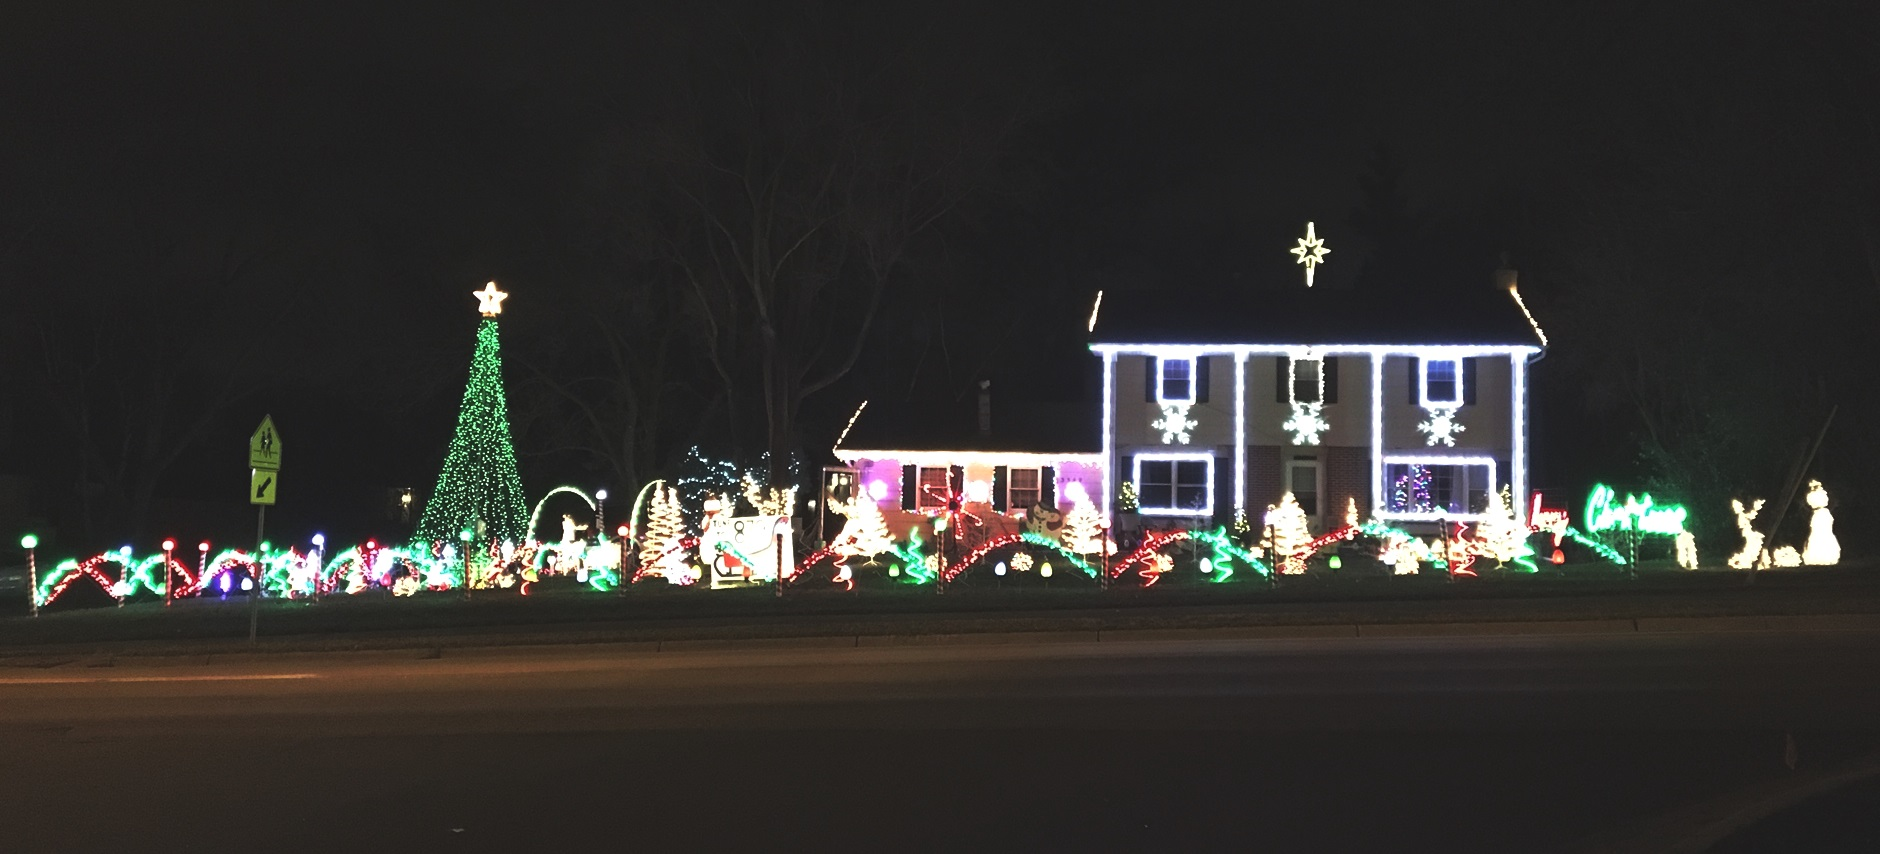 larsons lights - Newest Christmas Lights